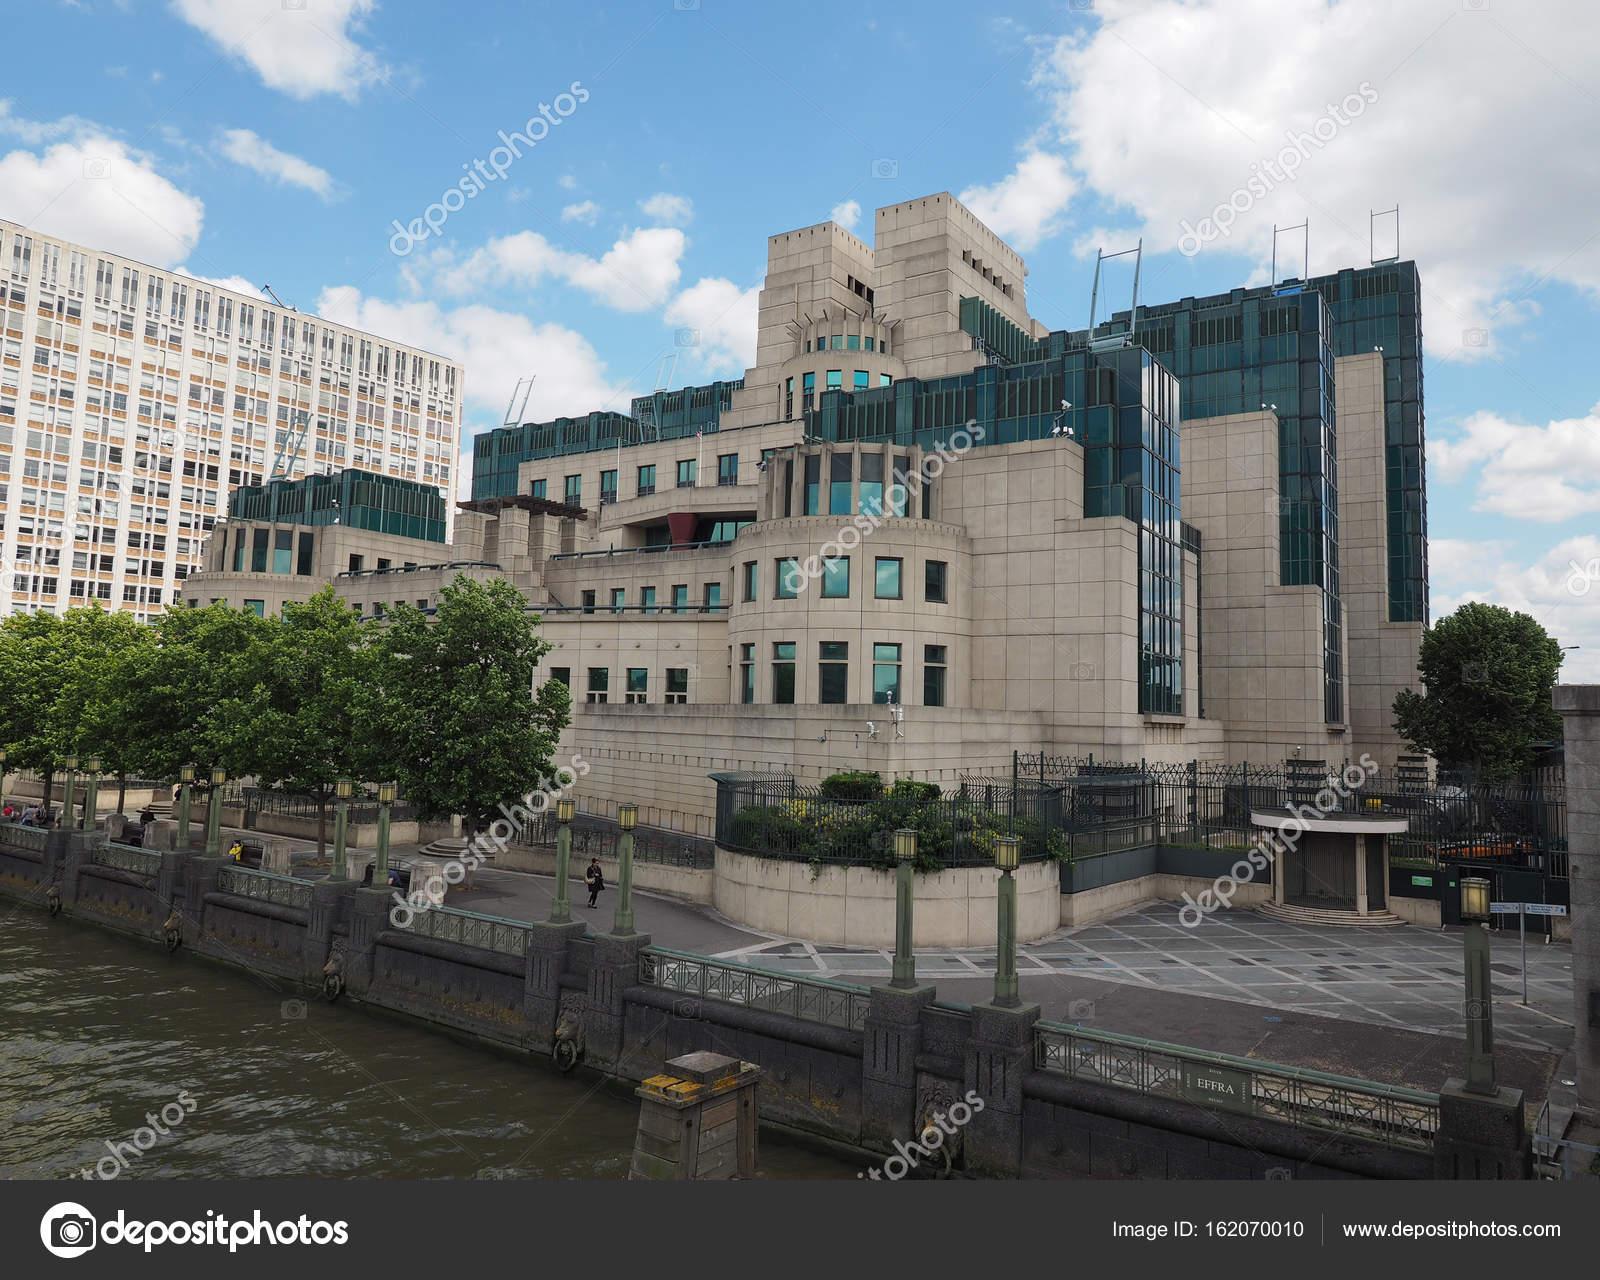 Britse Geheime Dienst In Londen Redactionele Stockfoto